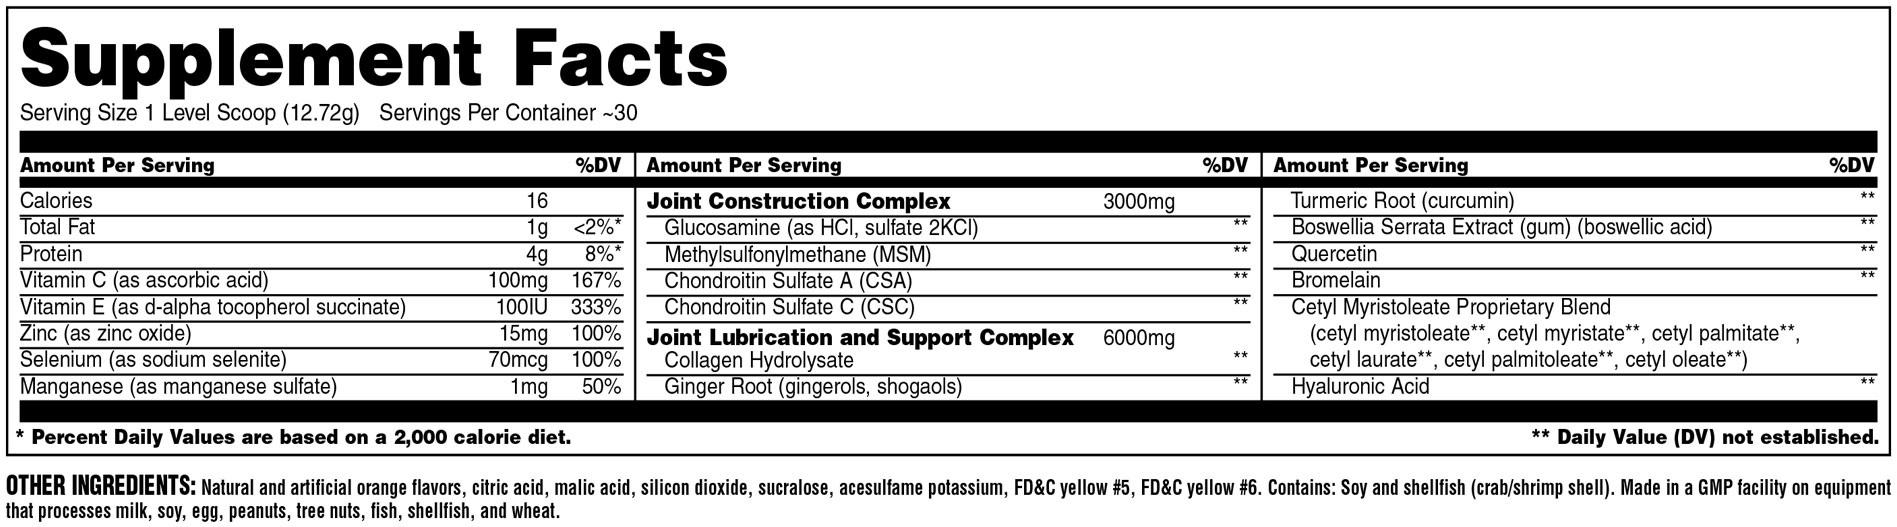 animalflexpowderorangefacts_1_1_1.jpg